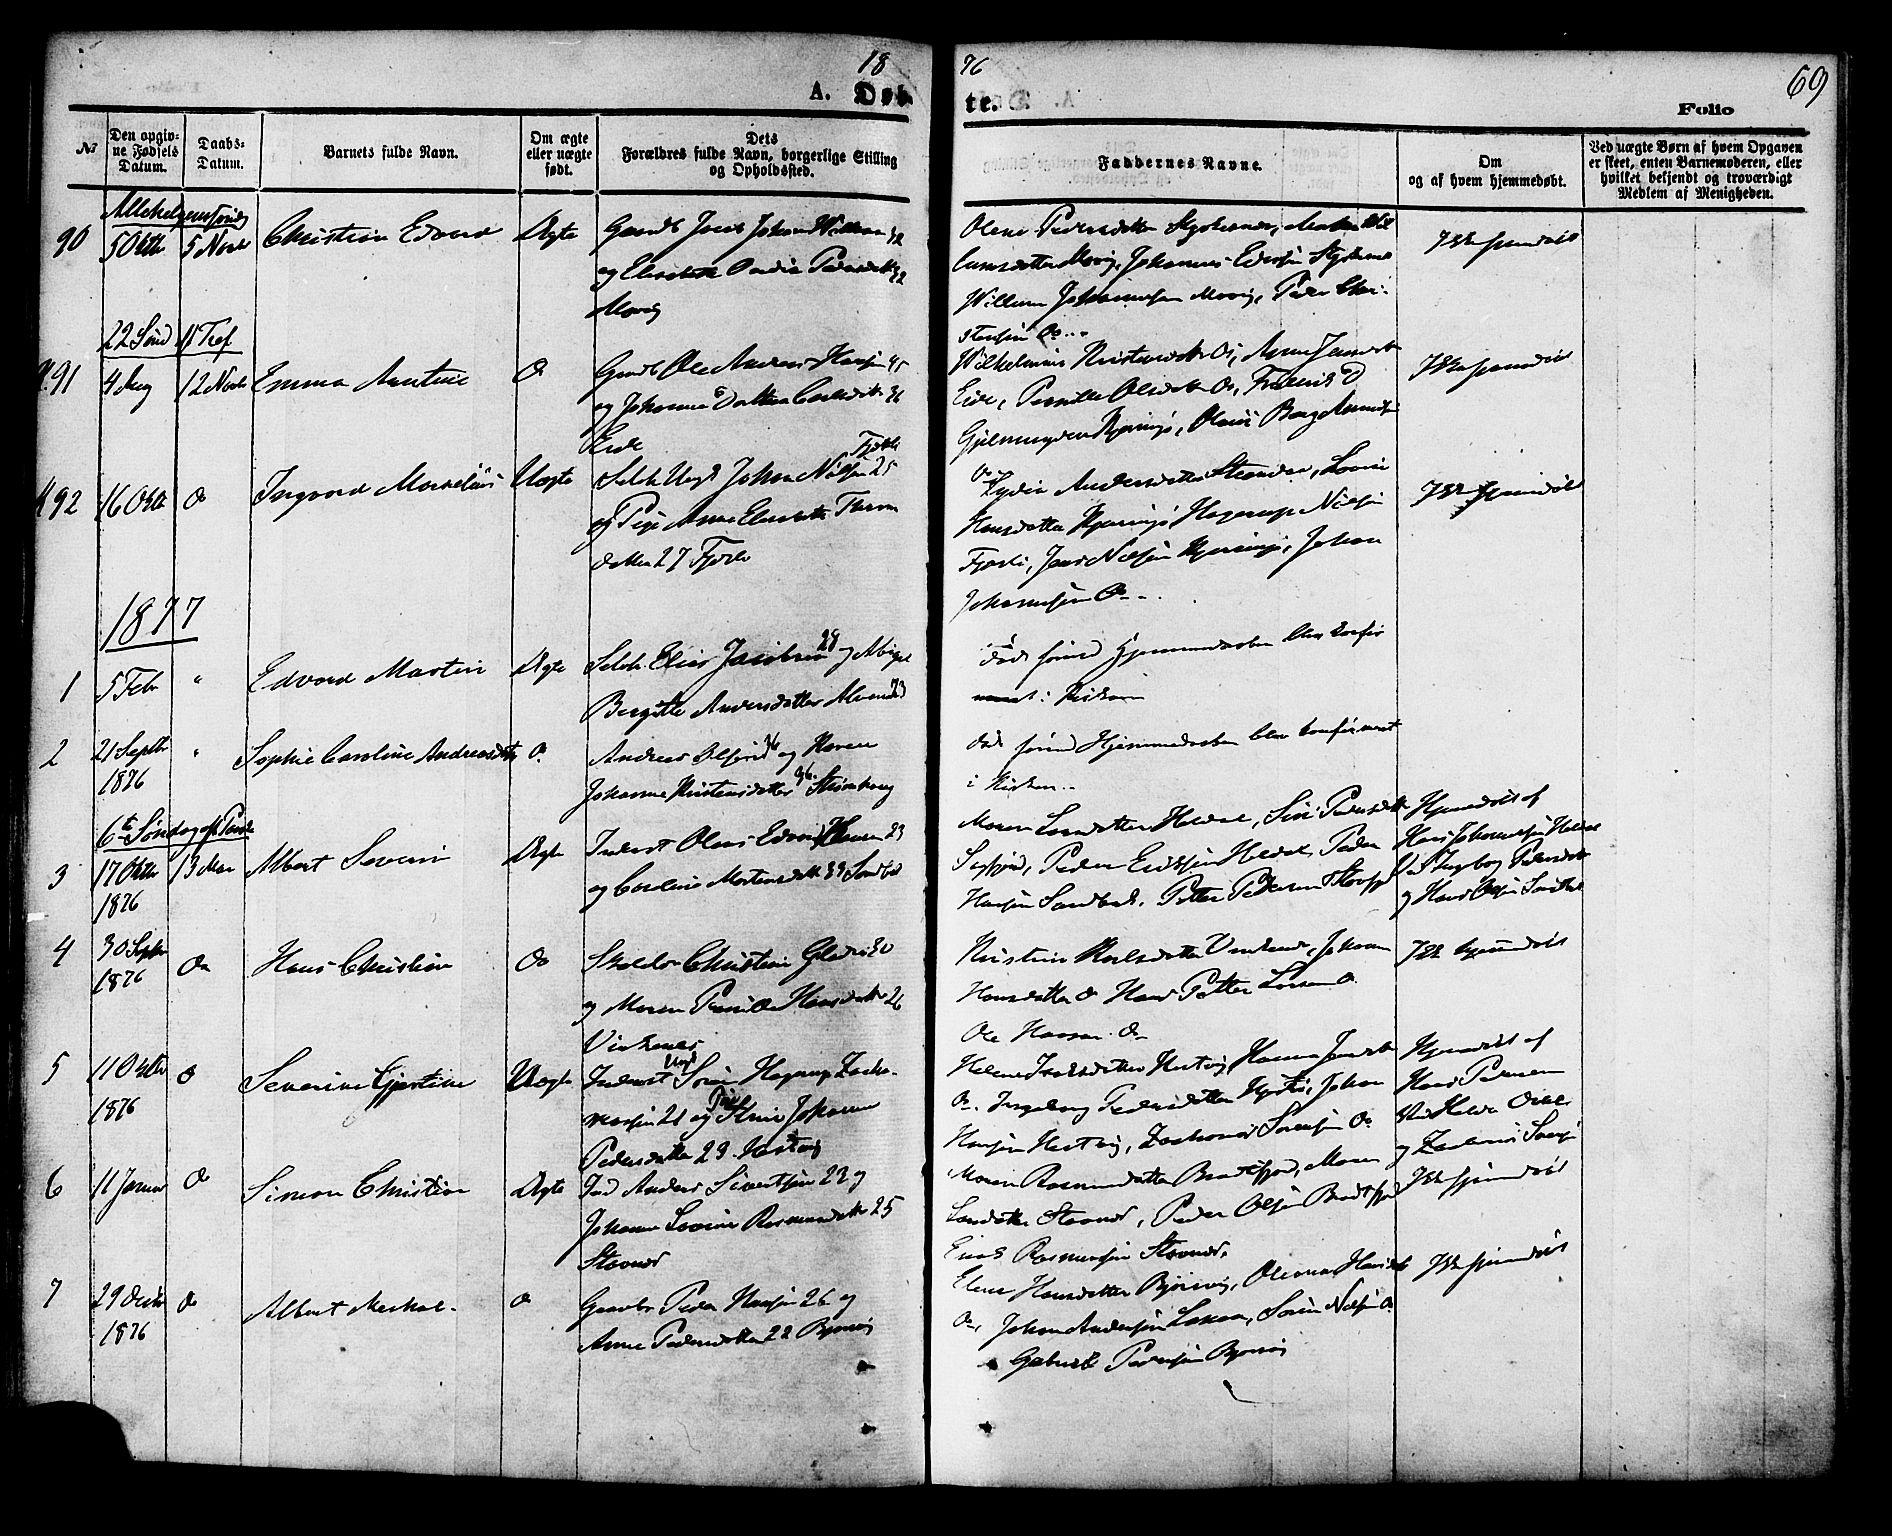 SAT, Ministerialprotokoller, klokkerbøker og fødselsregistre - Nordland, 853/L0771: Ministerialbok nr. 853A10, 1870-1881, s. 69